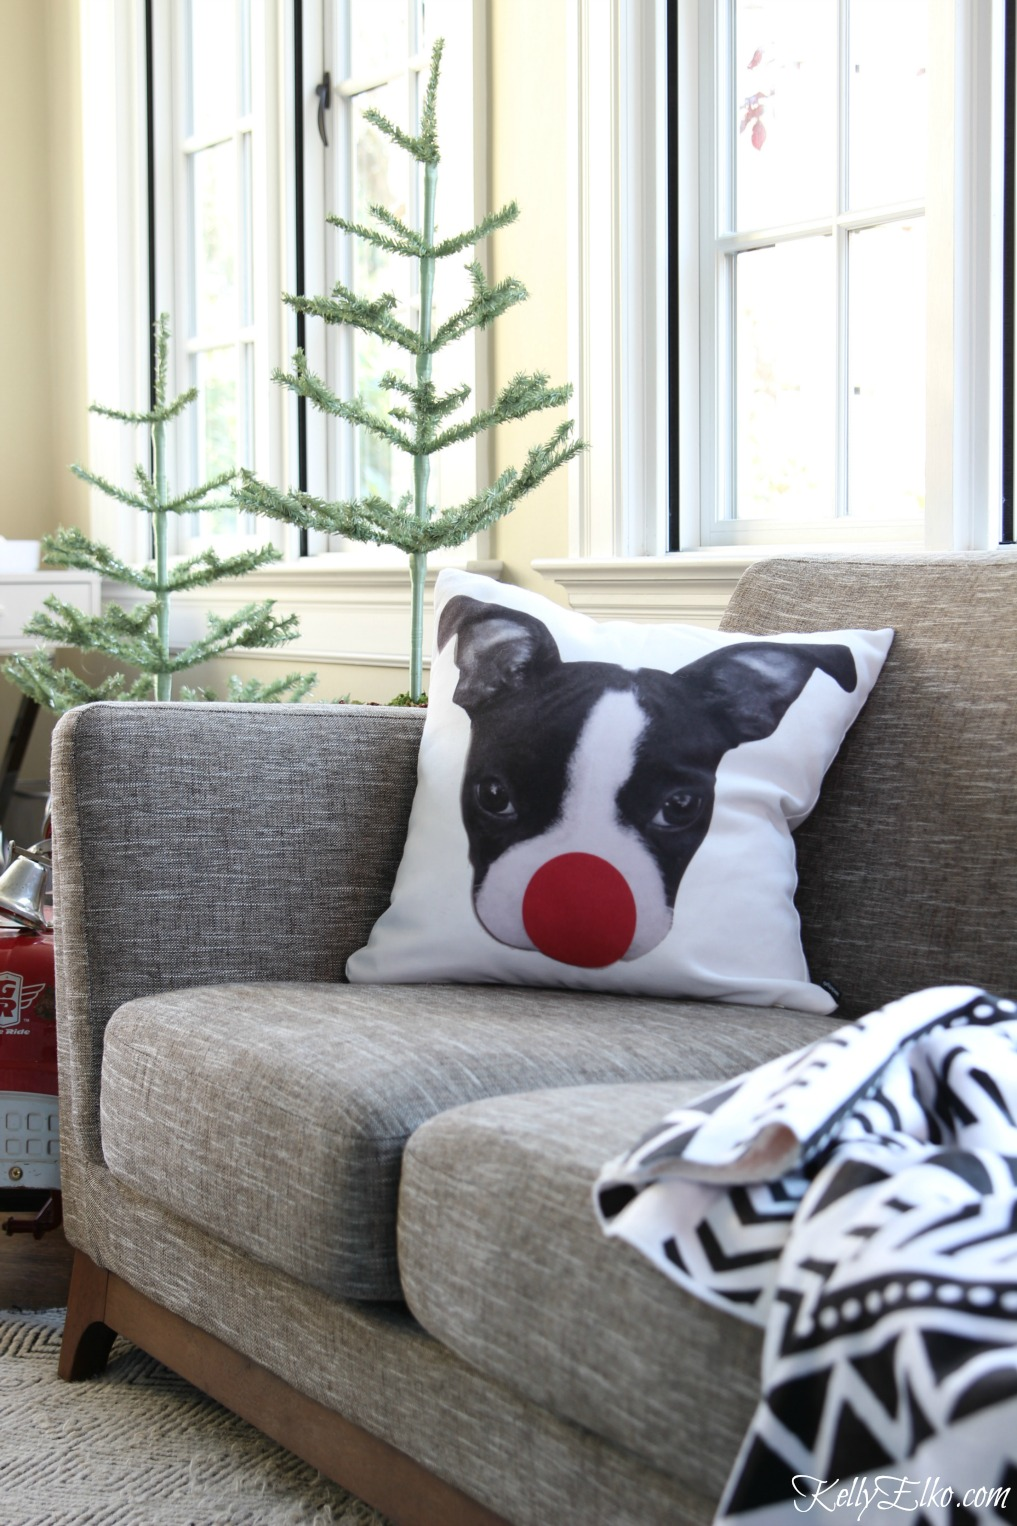 Love this adorable Boston Terrier Rudolph pillow kellyelko.com